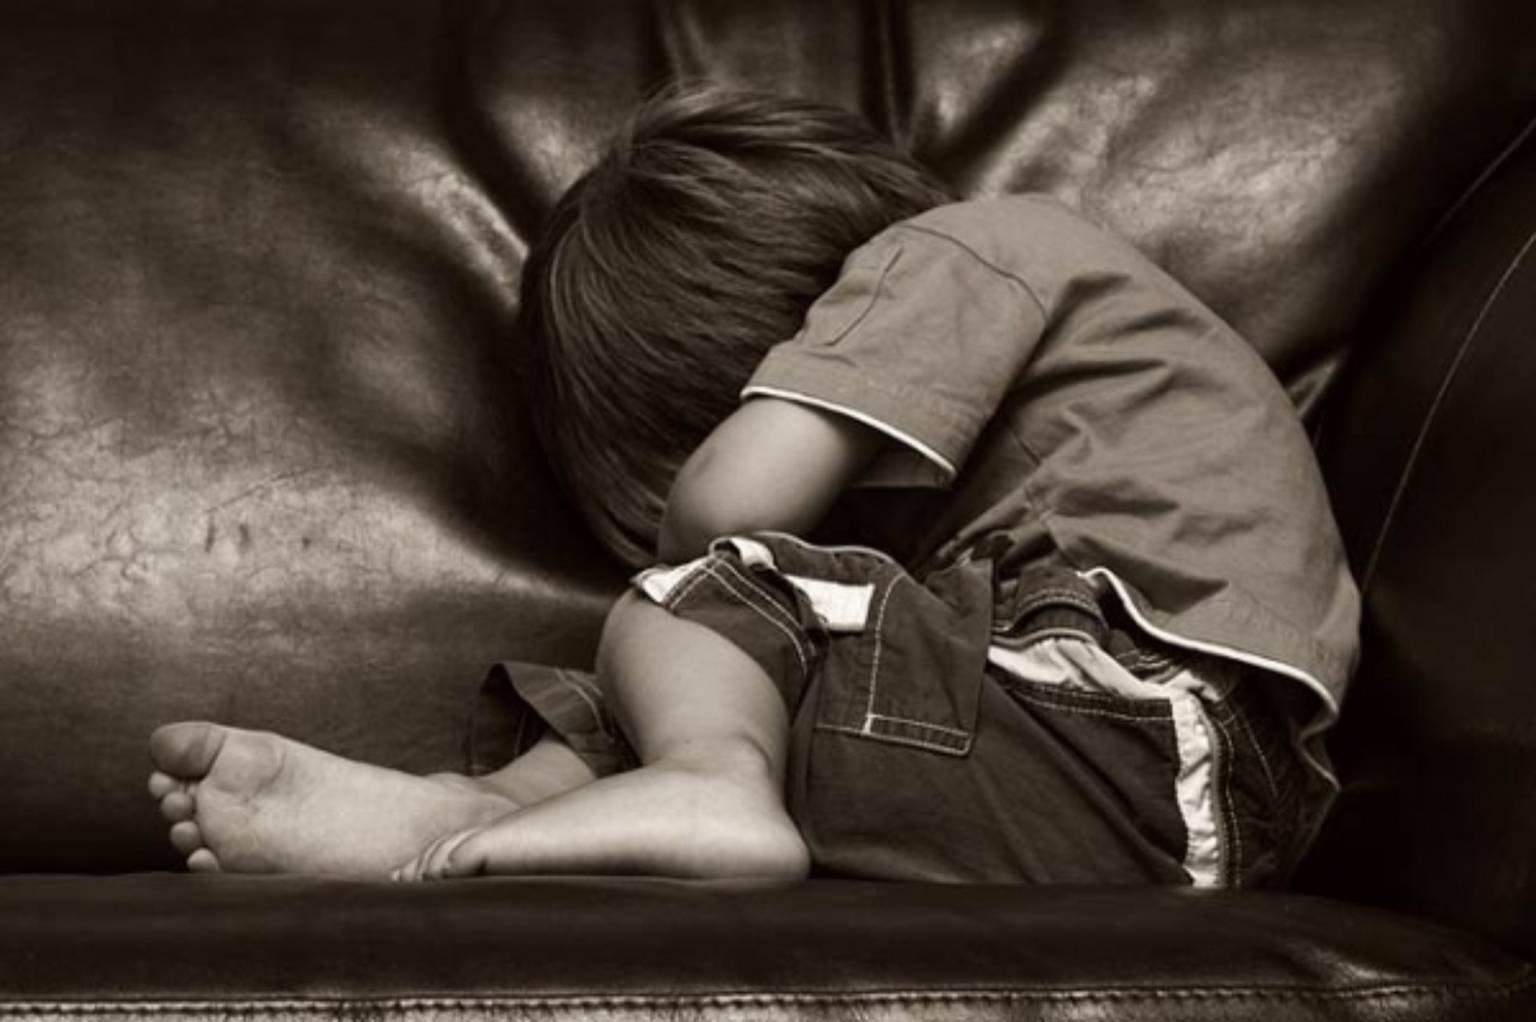 Заступиться за мать во сне